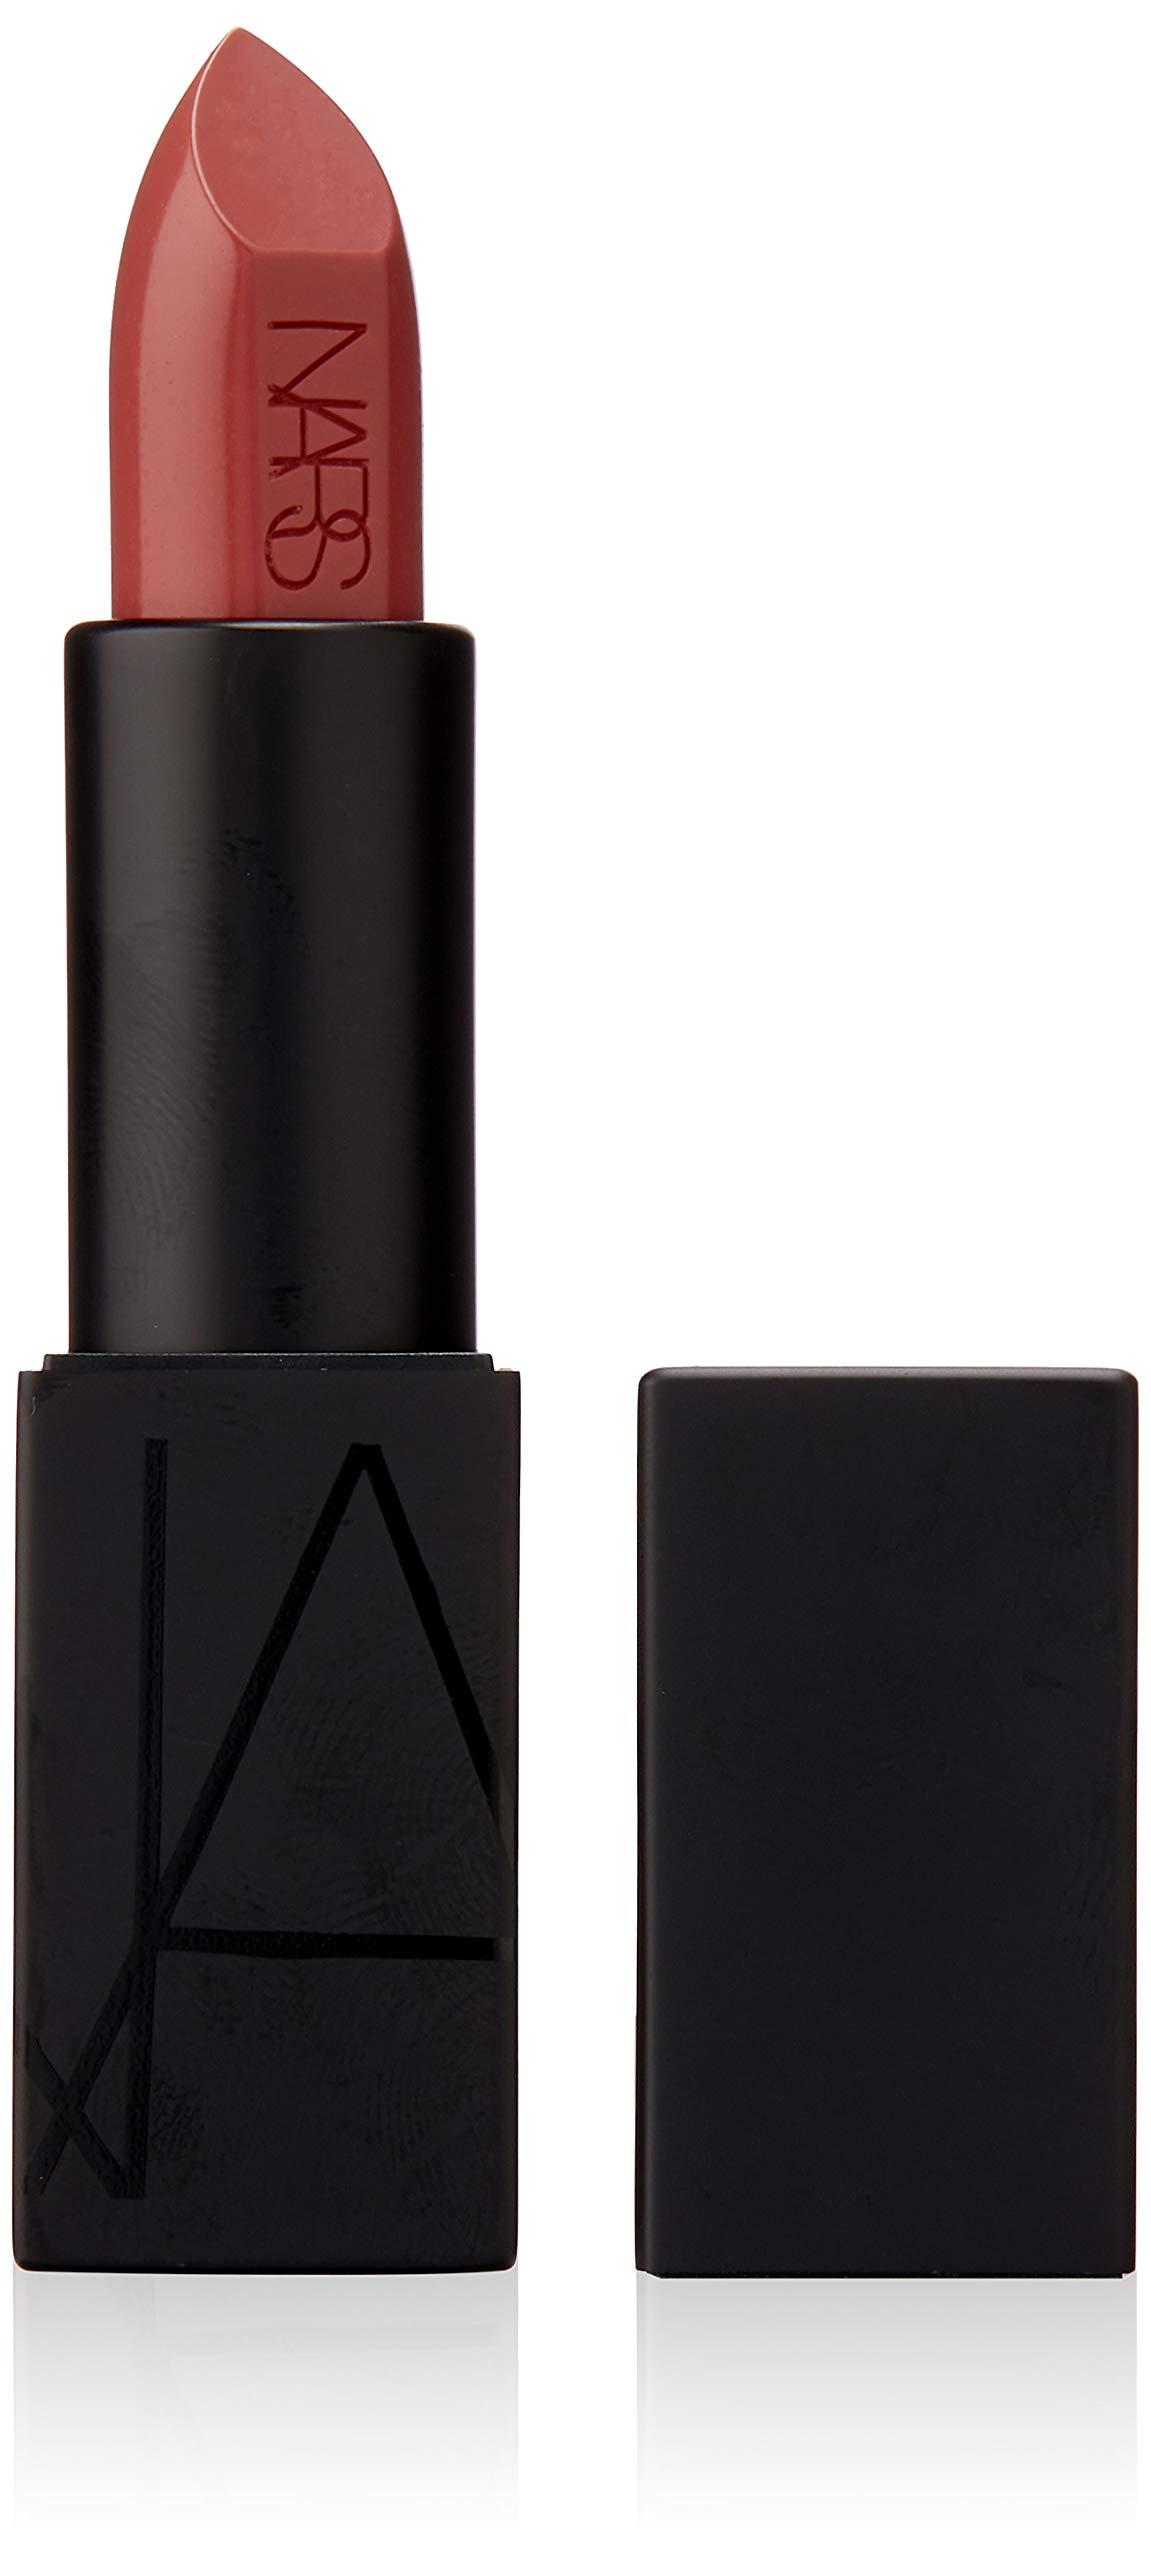 Amazoncom Nars Audacious Lipstick Anita 014 Ounce Beauty